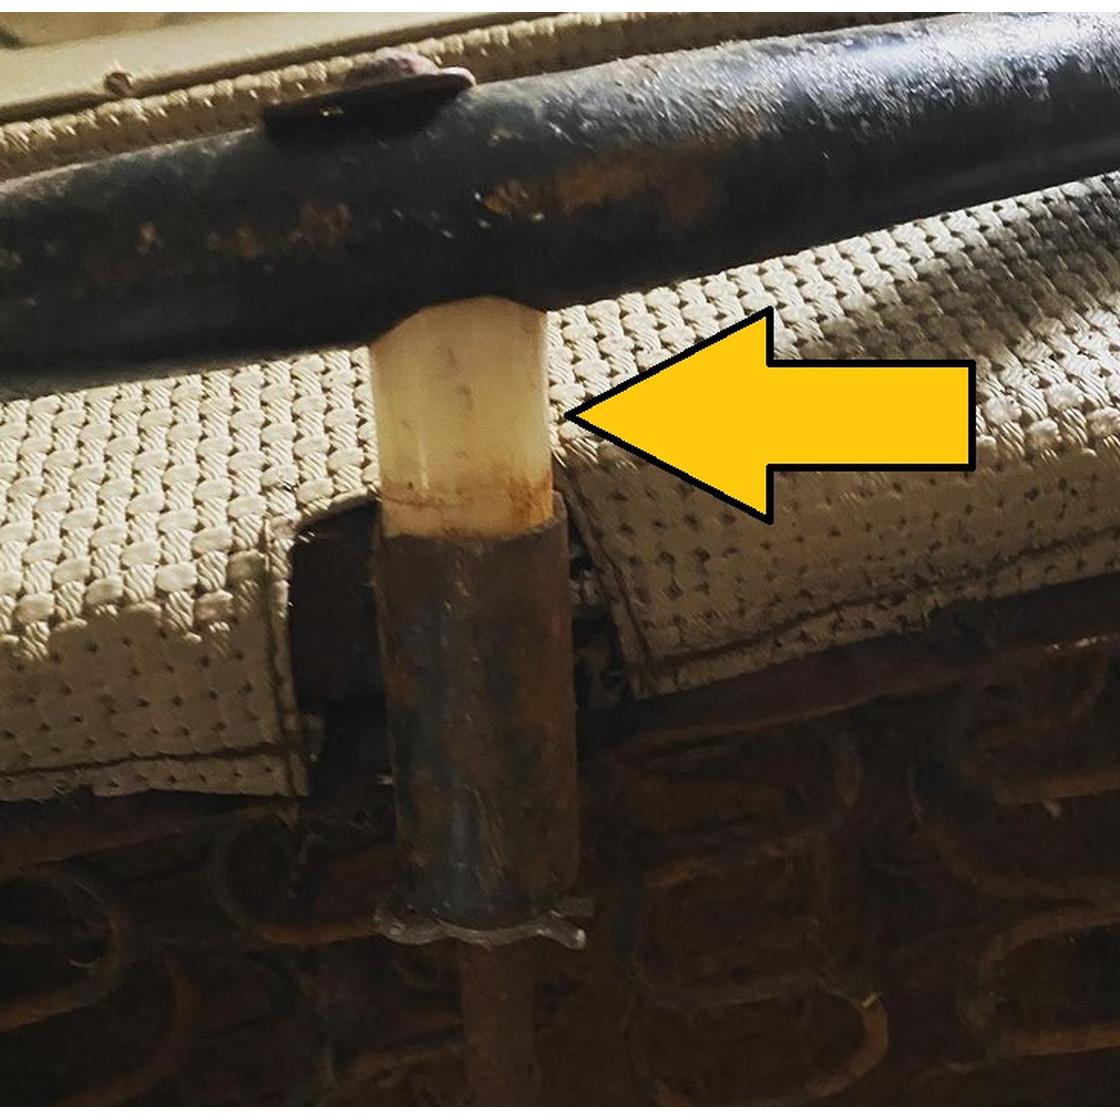 Yanmar B17-2 Mini Excavator Wiring Diagrams Z172180-1021D